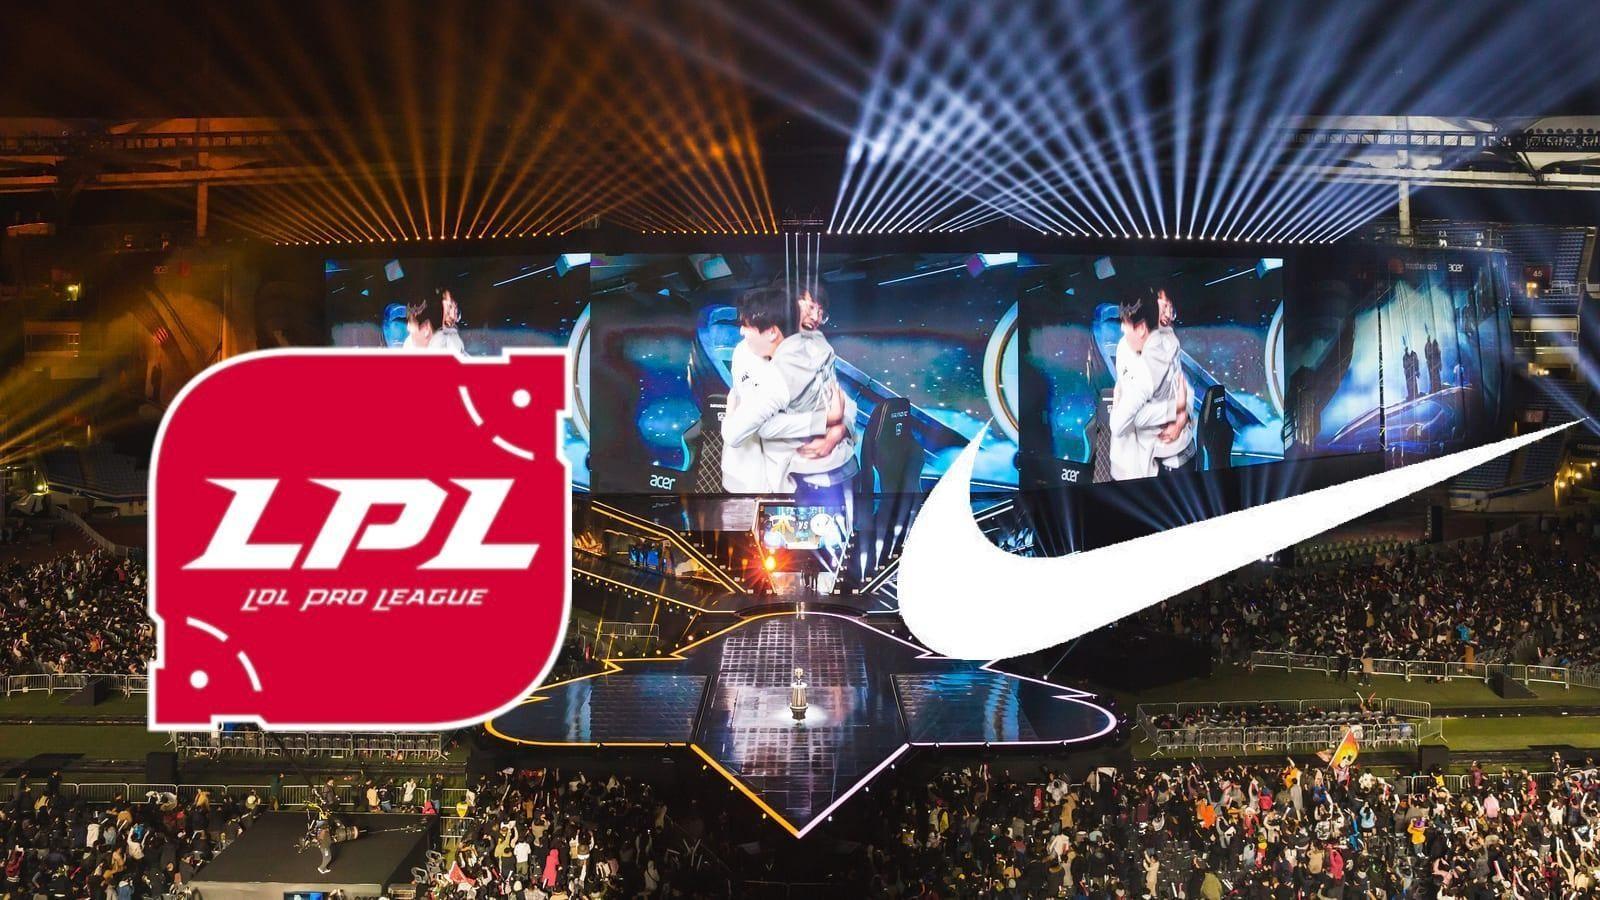 sponsors de esports a nivel mundial: Nike